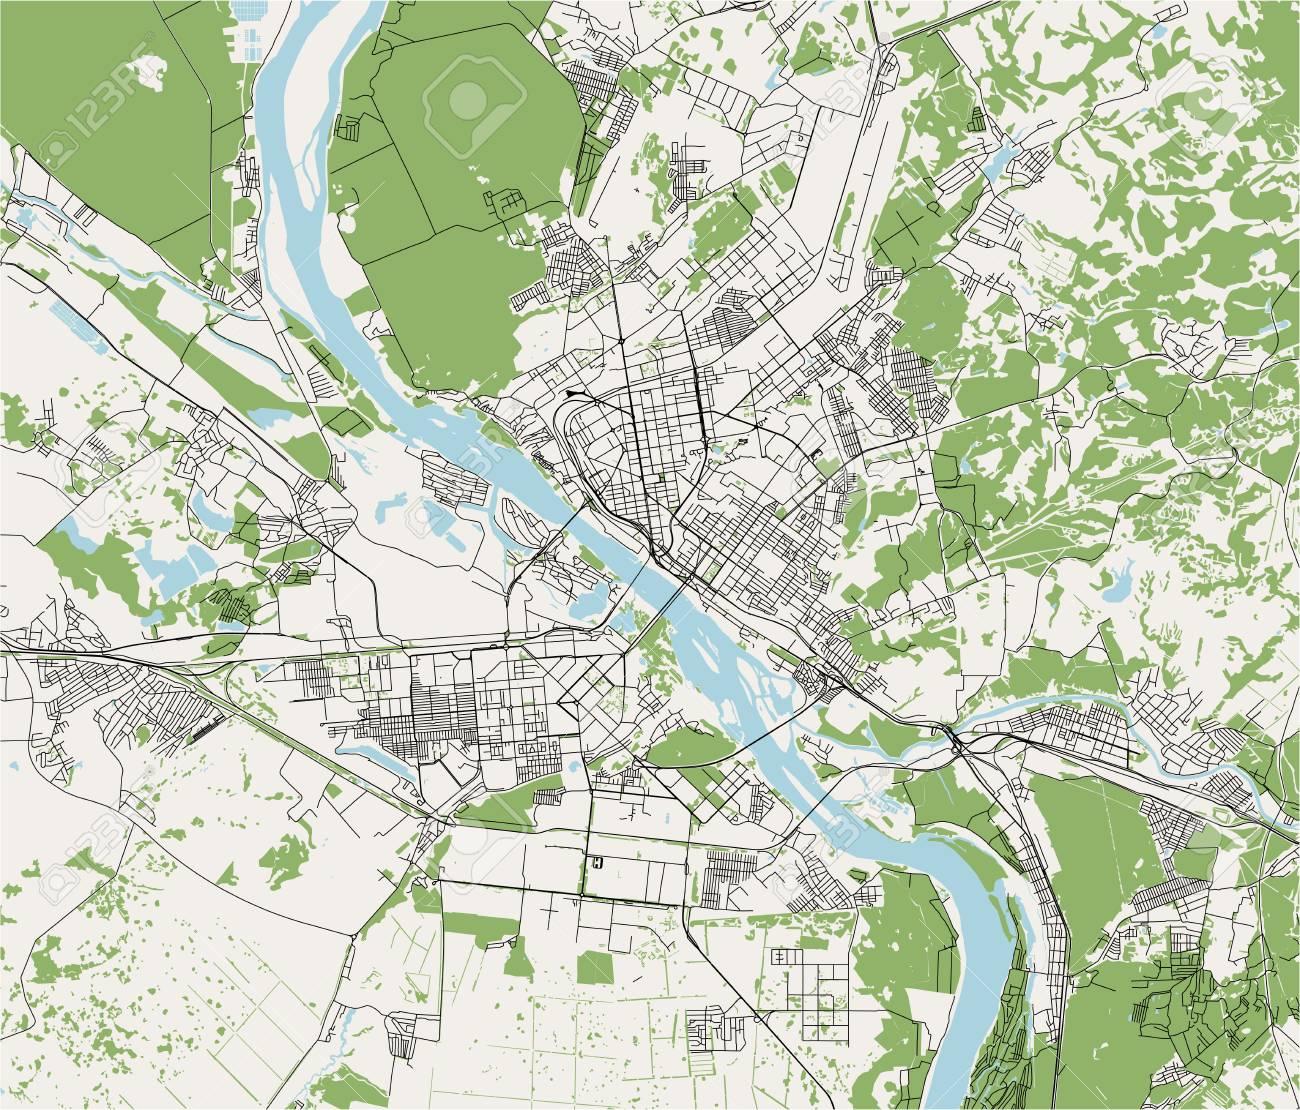 Vector Map Of The City Of Novosibirsk Siberia Russia Lizenzfrei